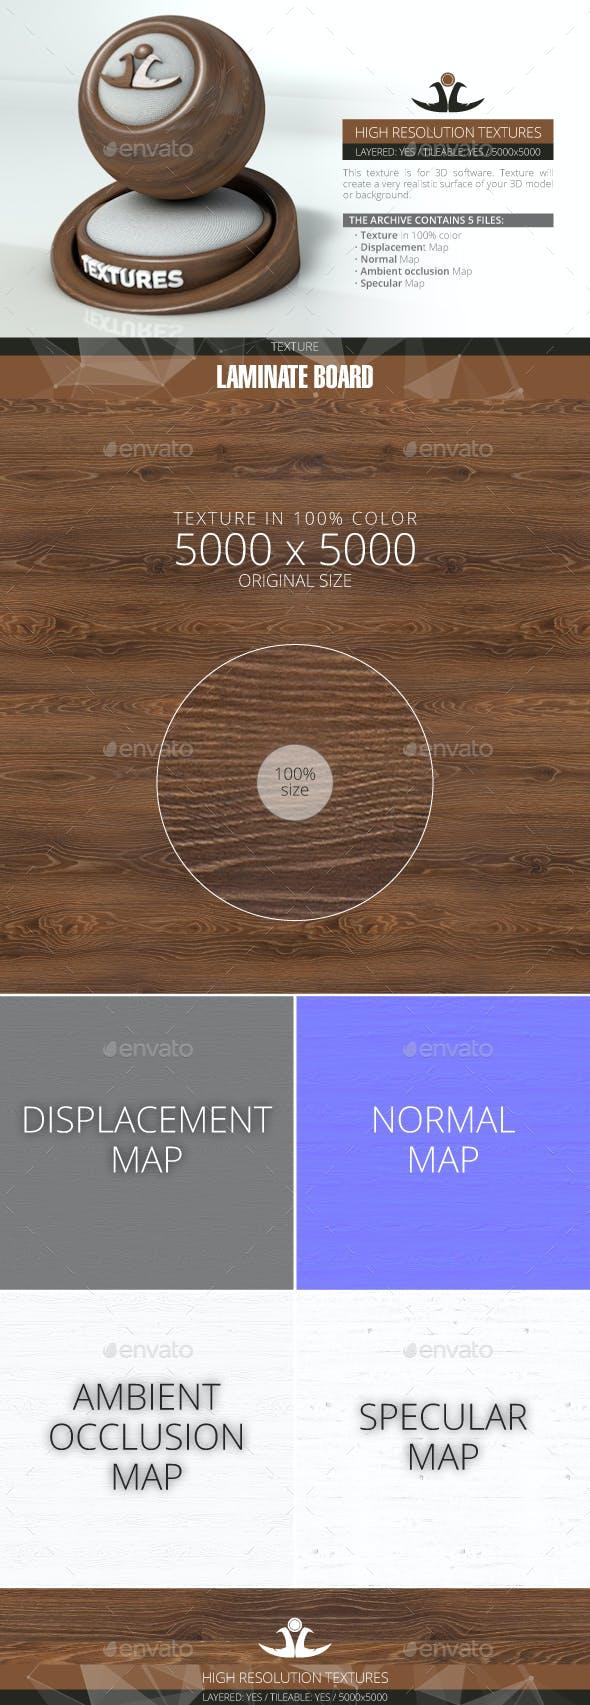 Laminate Board 10 - 3DOcean Item for Sale